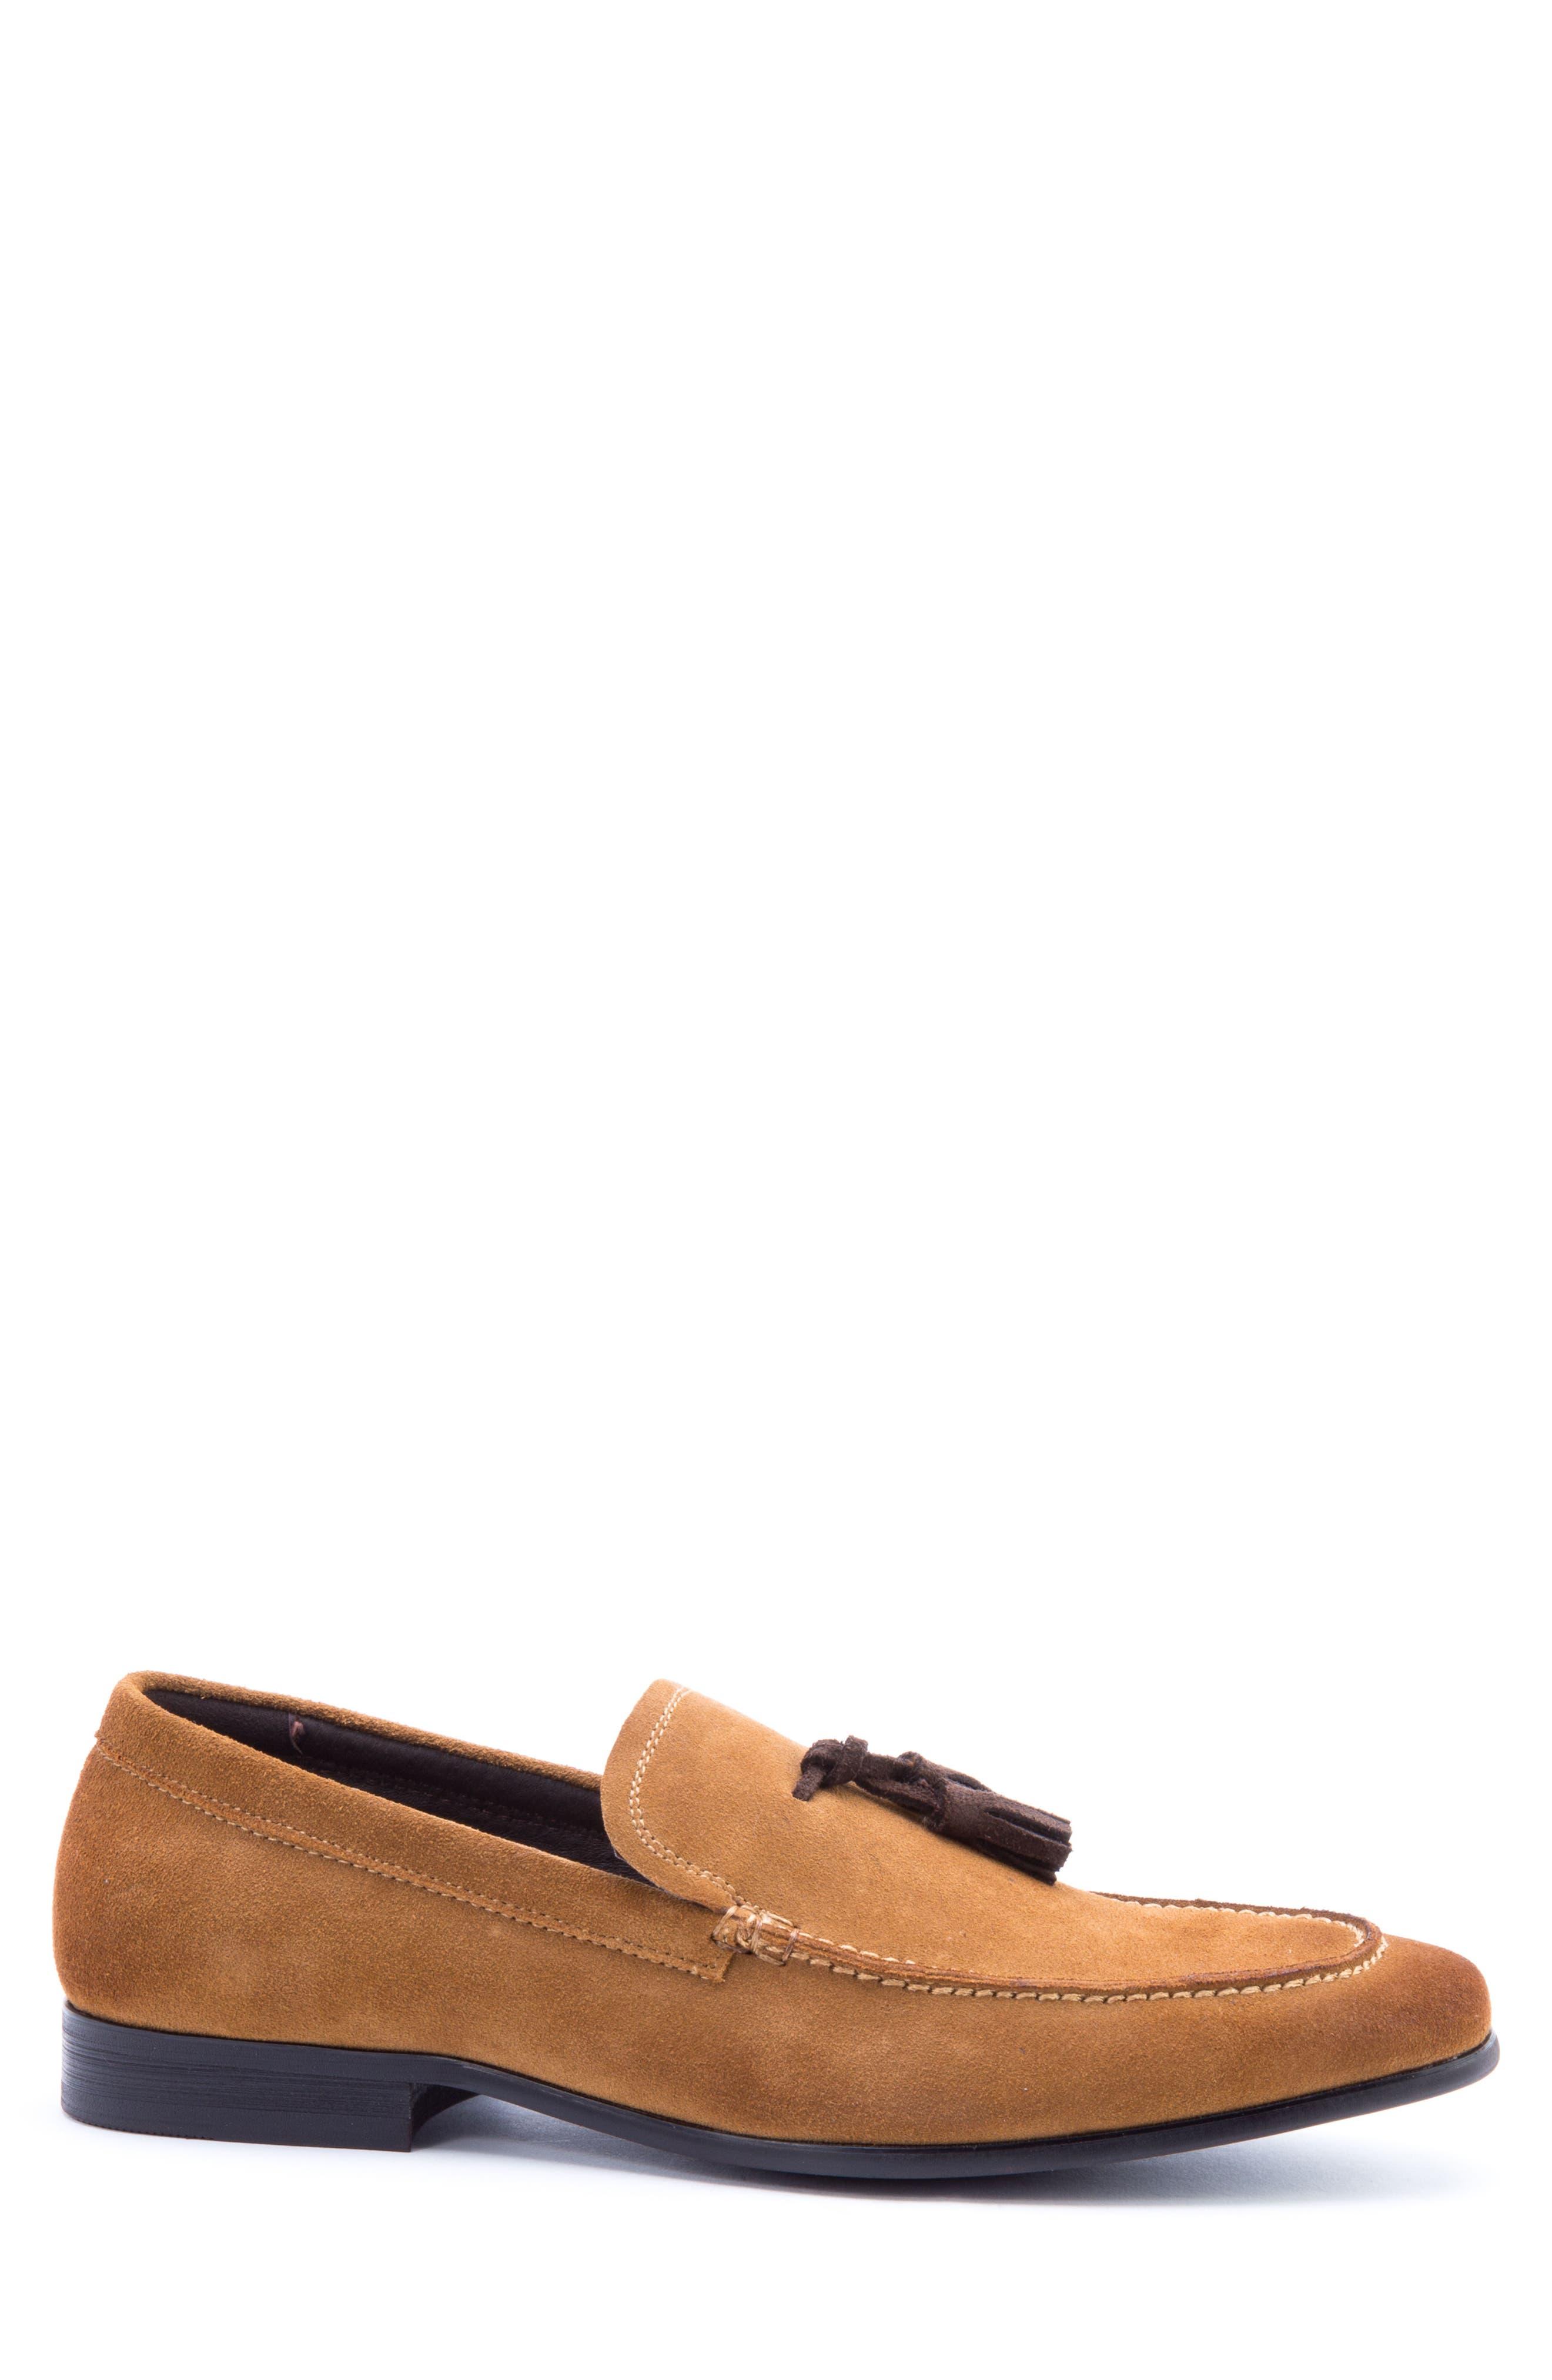 Severn Tassel Venetian Loafer,                             Alternate thumbnail 3, color,                             COGNAC SUEDE